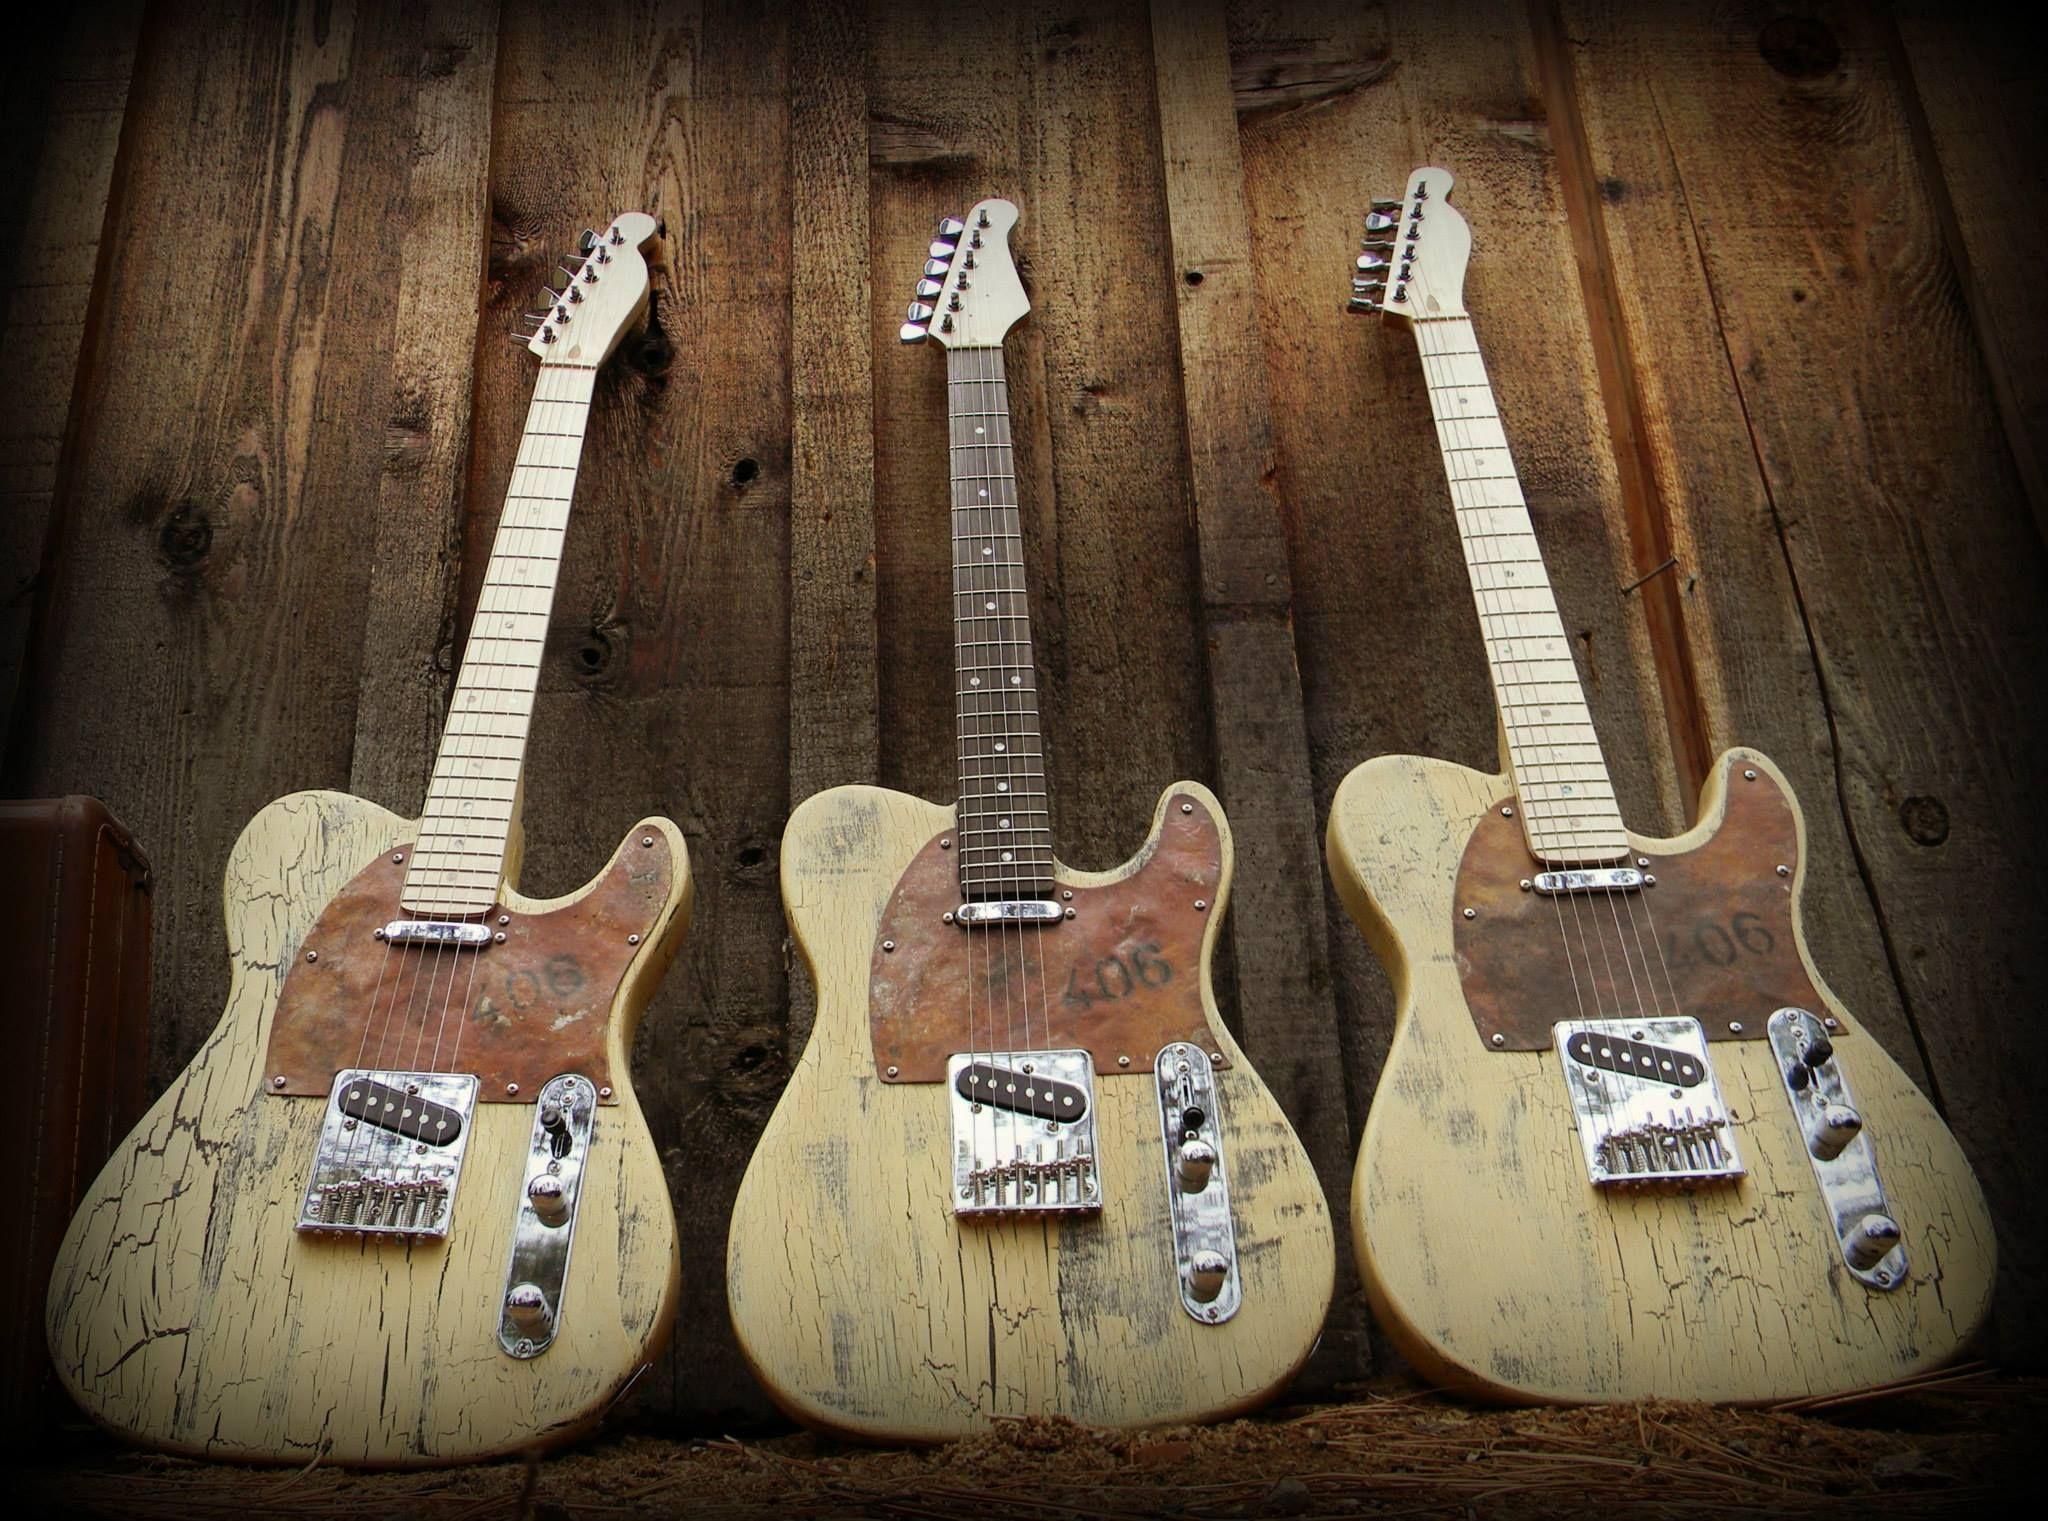 Fender Telecaster Gitarrenverstärker Vintage gitarren E gitarren Musikinstrumente Montana Delta Blues Akustisch Gitarre